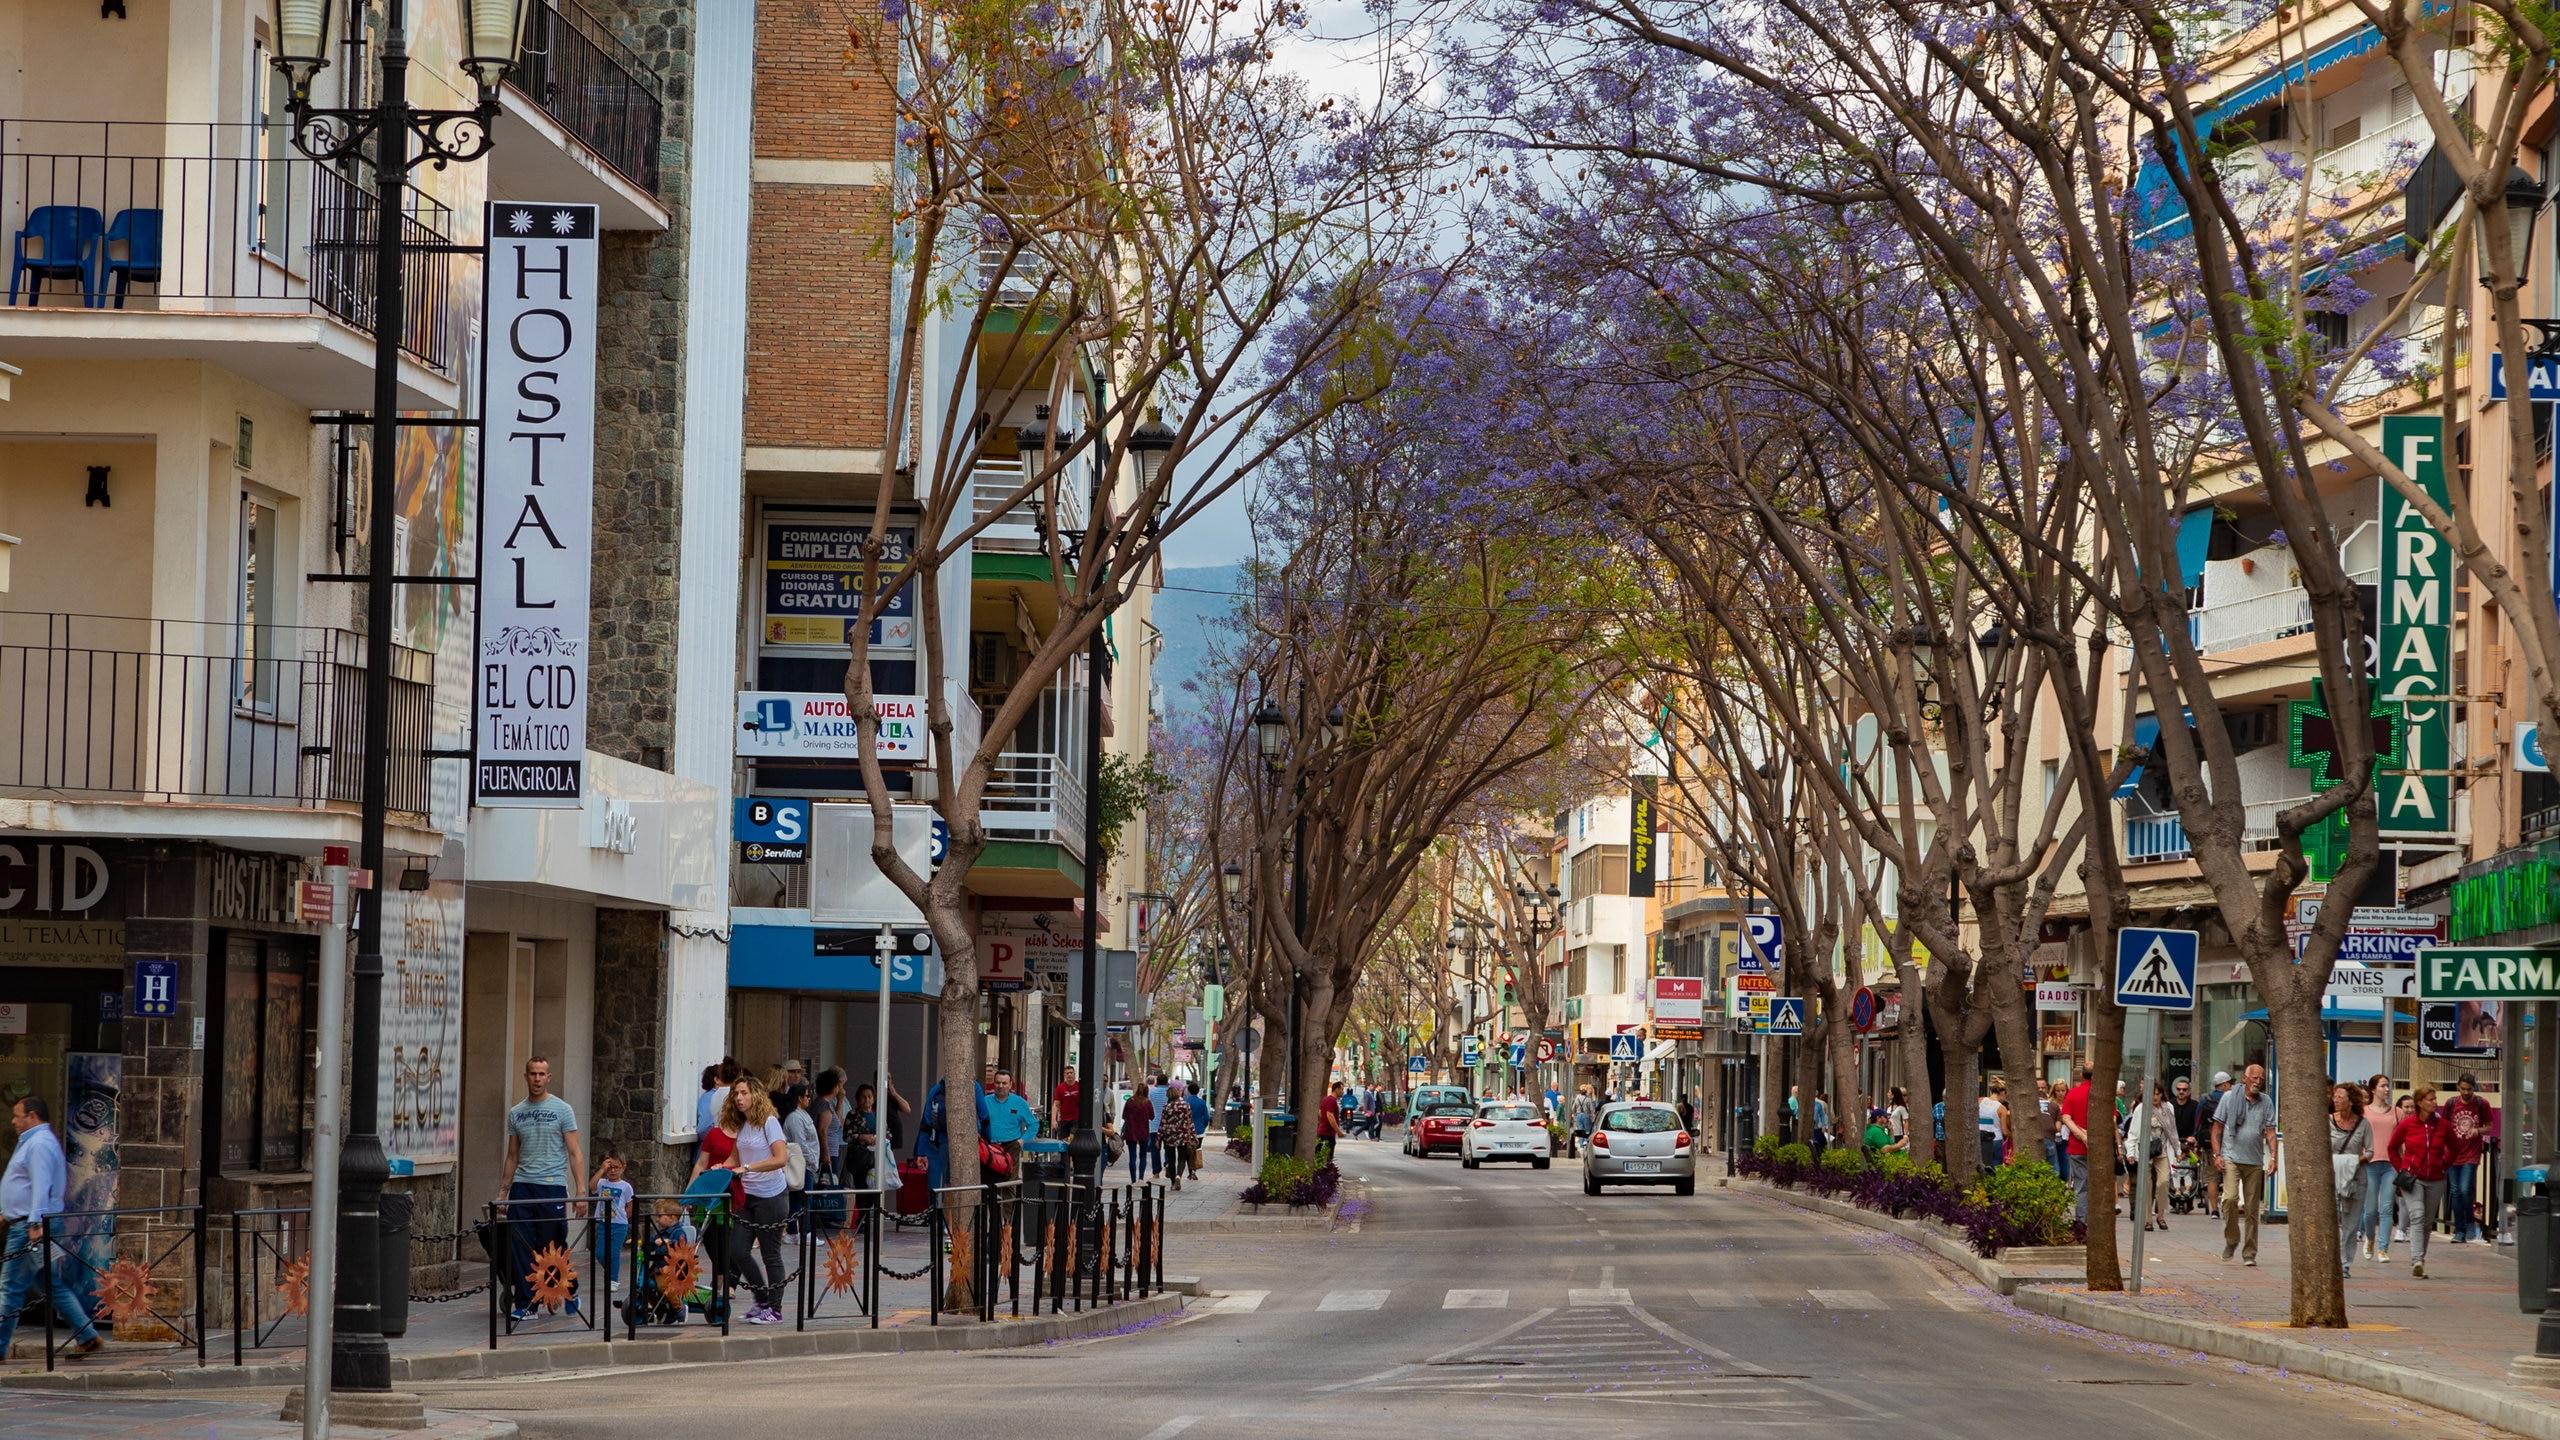 Fuengirola City Centre, Fuengirola, Andalusia, Spain